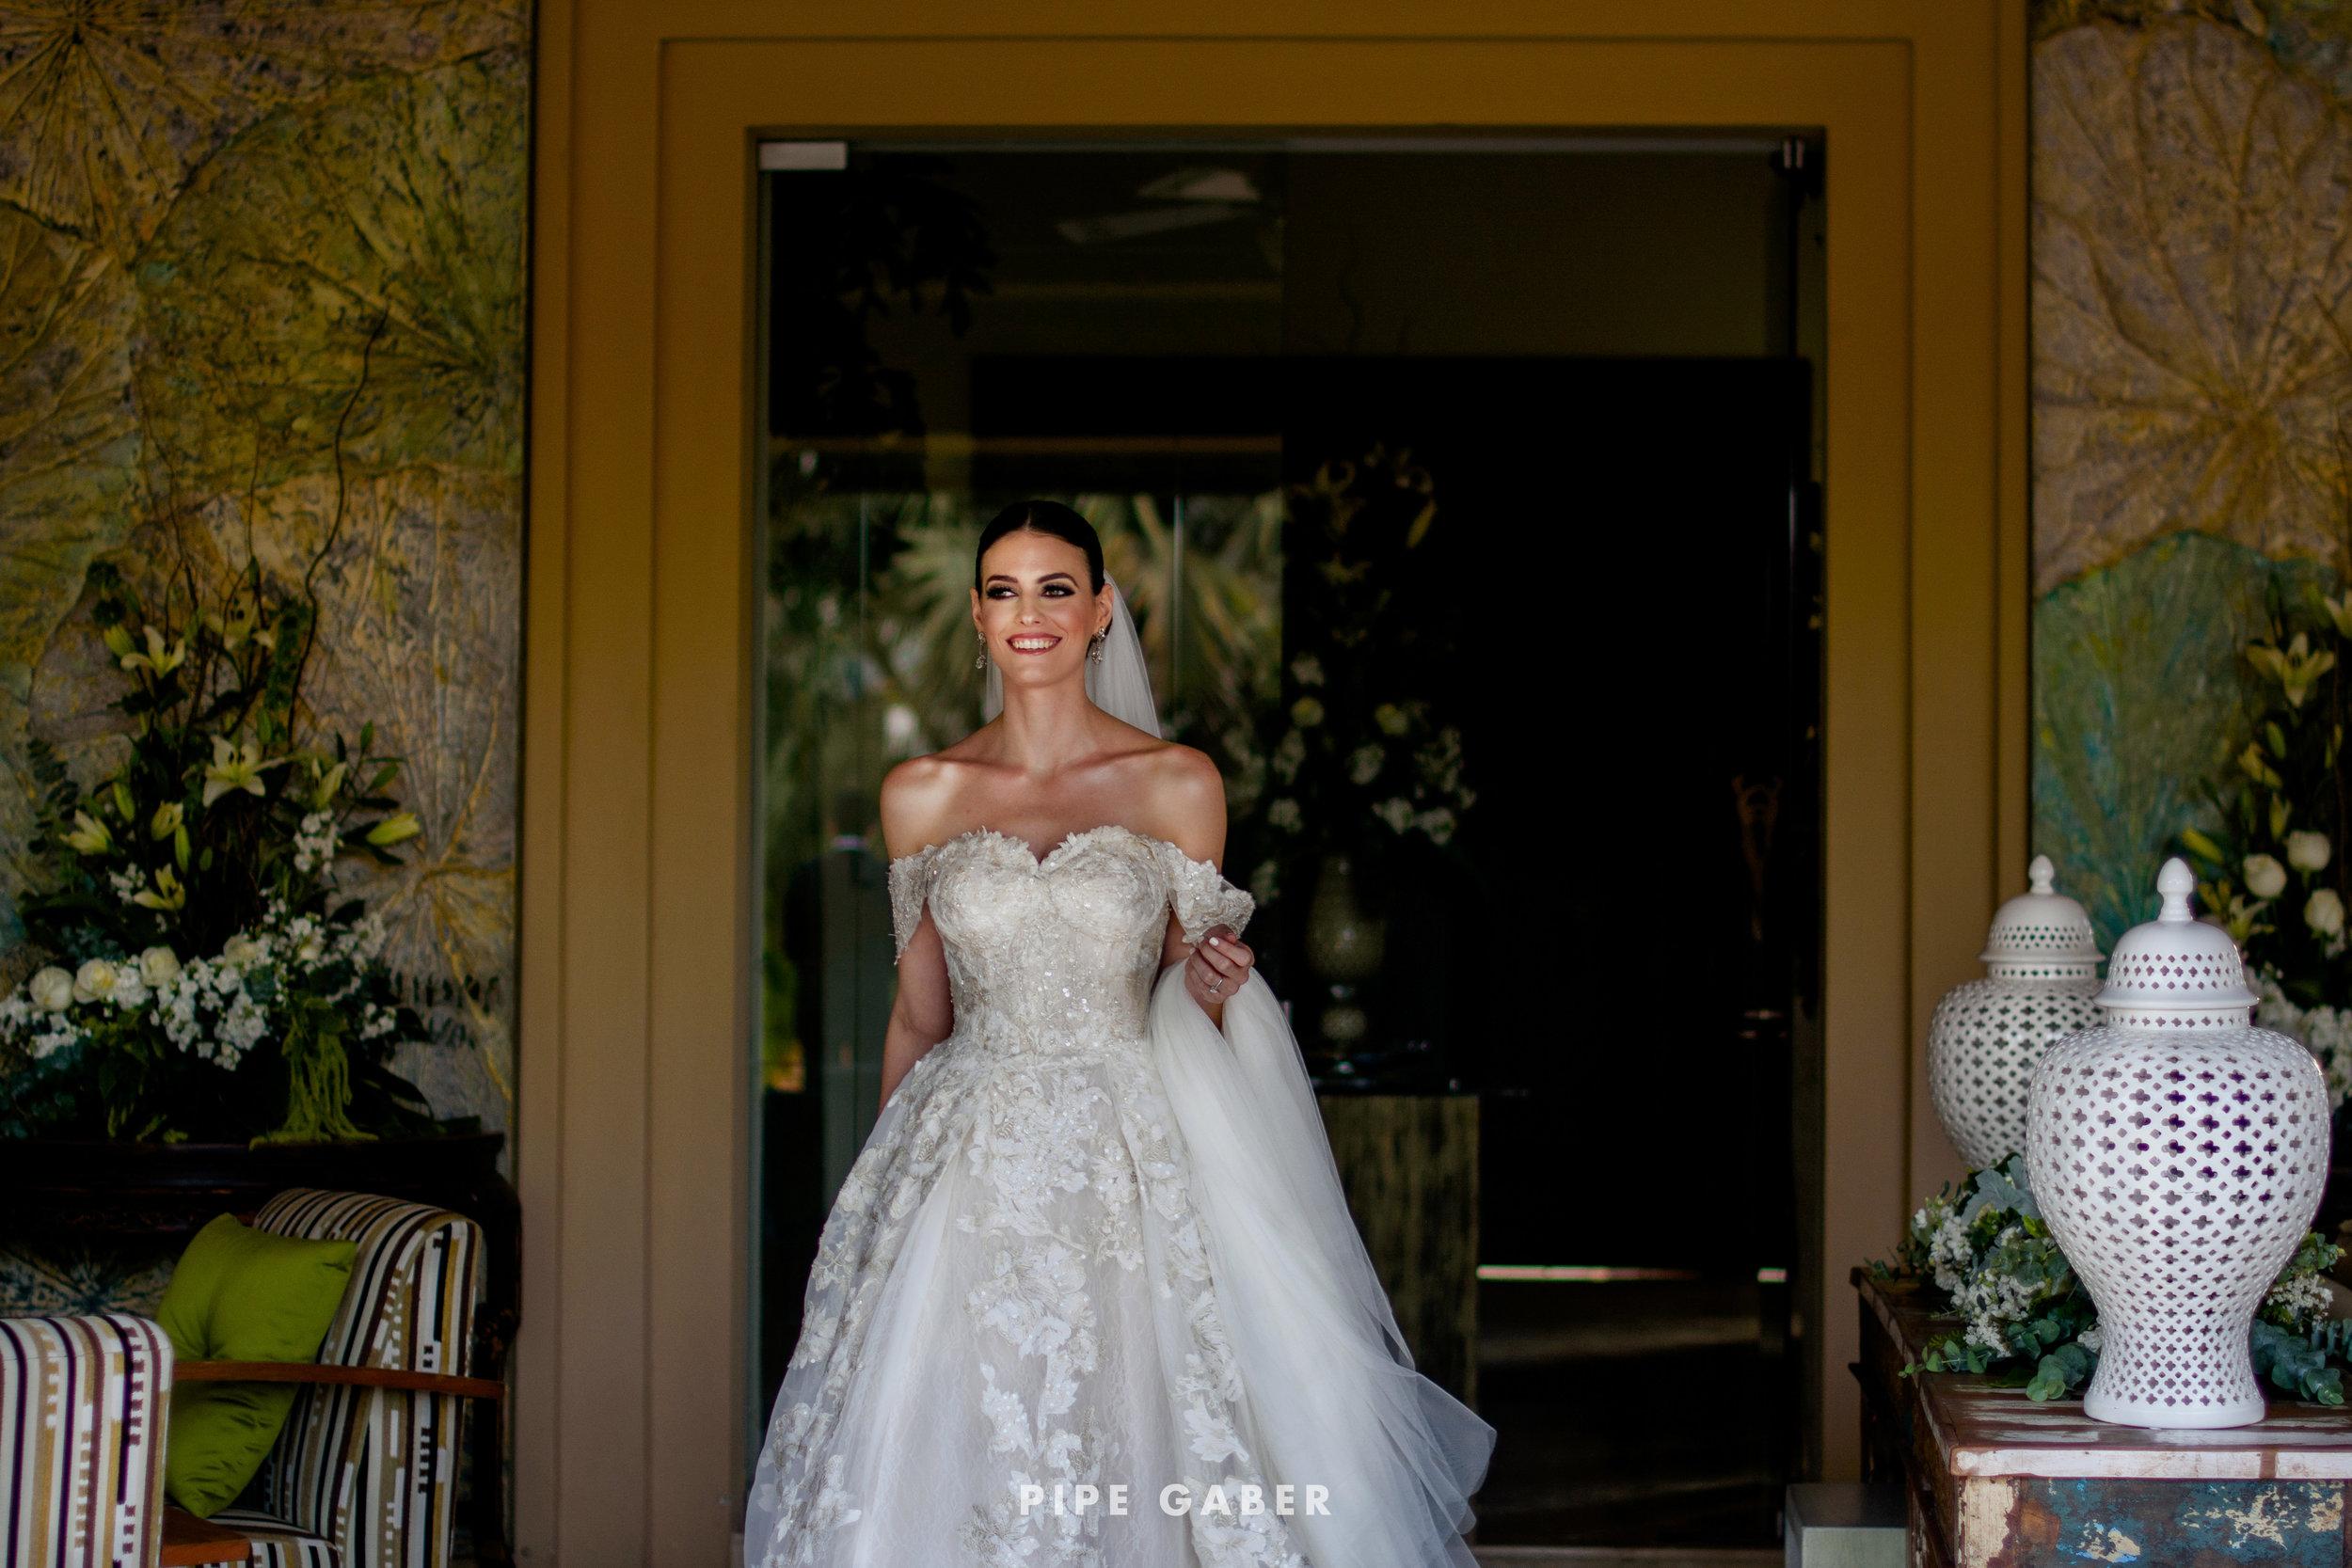 18_02_03_WEDDING_ALEXIS_ABIMERHI_ERICK_APT_0123.jpg